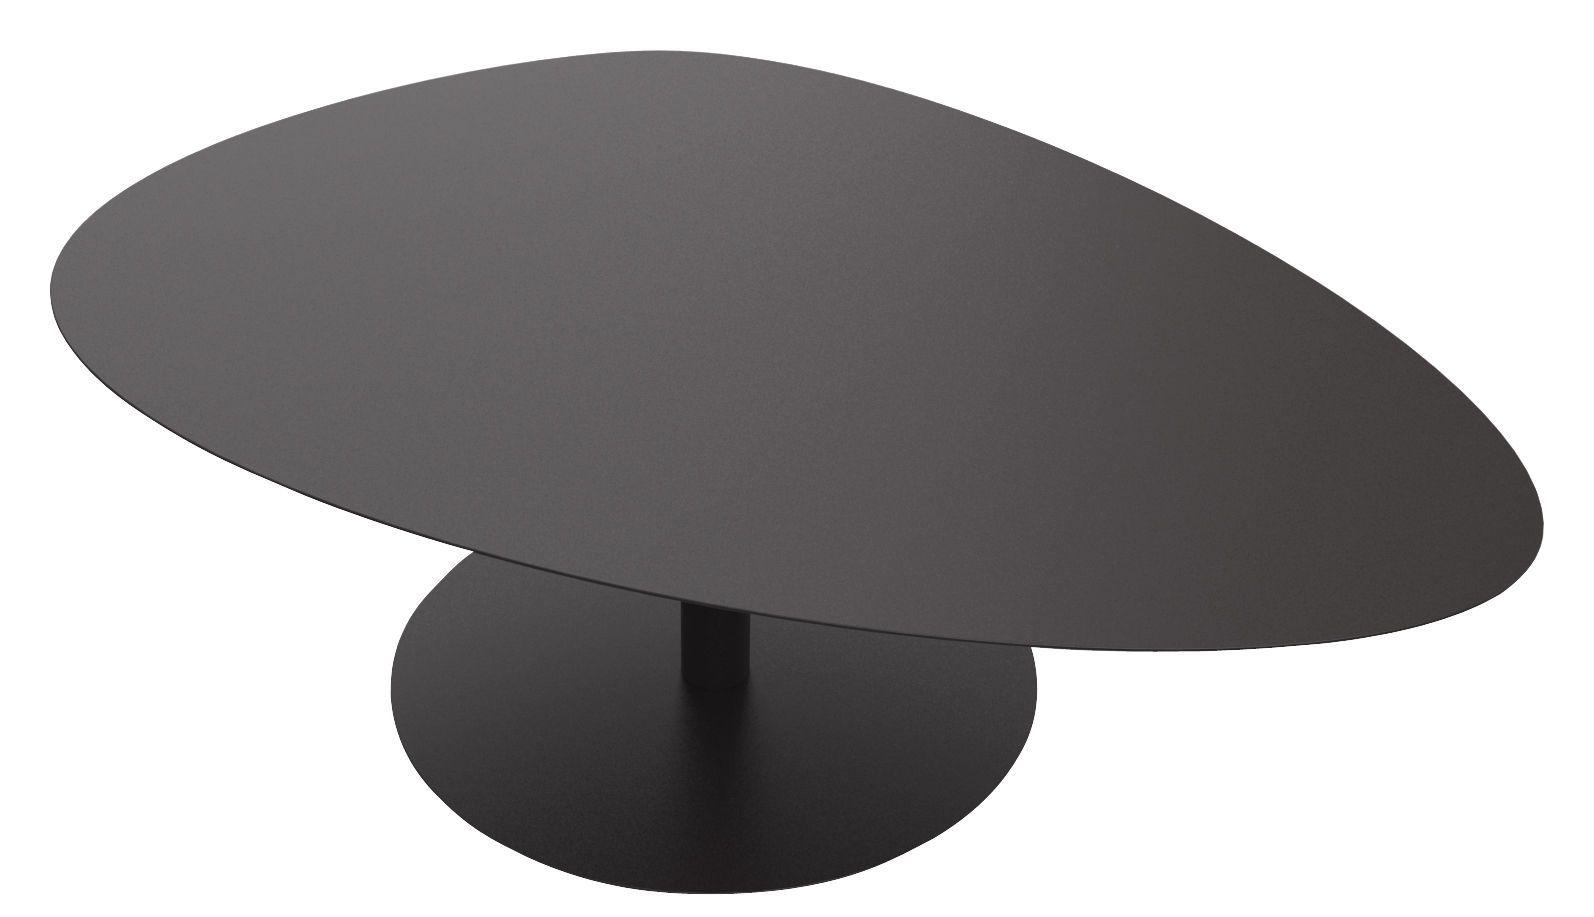 Table Basse Galet Xl Matiere Grise Noir Made In Design Table Basse Galet Table Basse Table Basse Design